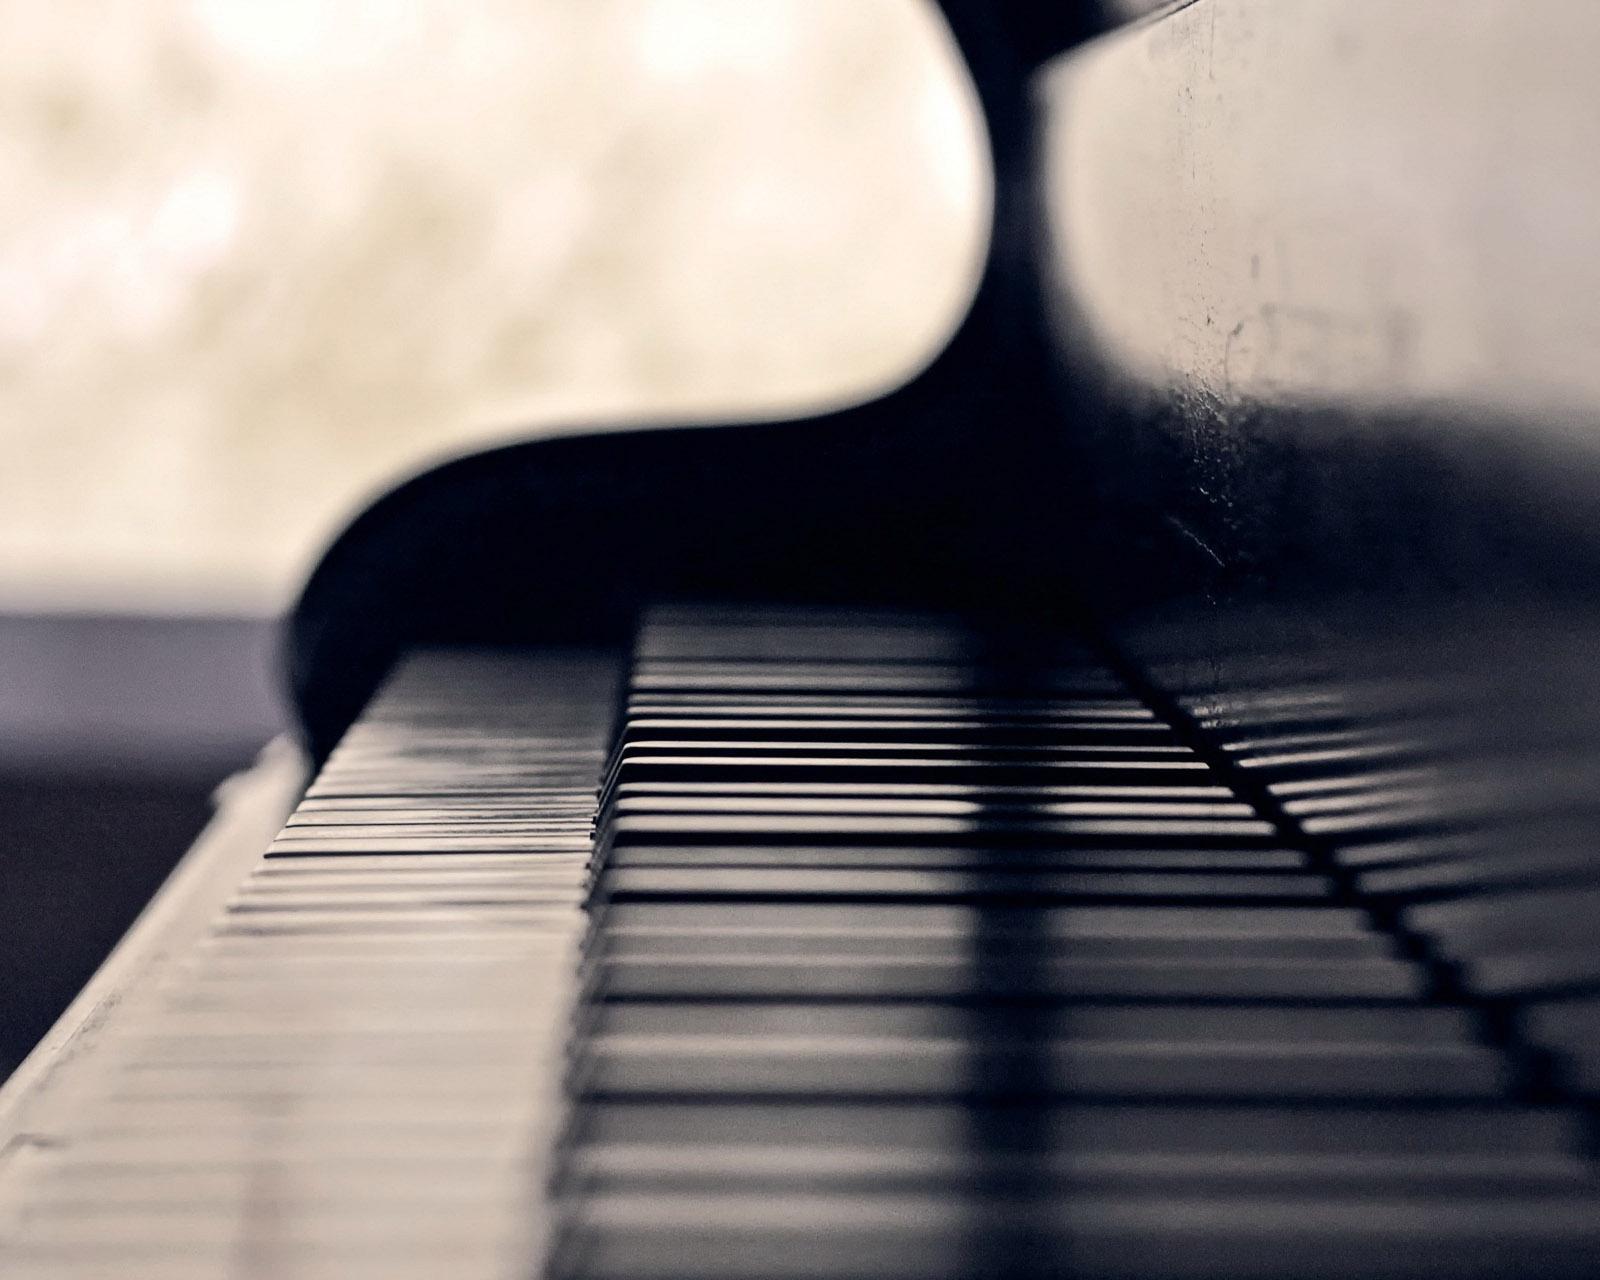 Free Download Piano Wallpaper 868511 Piano Wallpaper 868497 Piano Wallpaper 868483 1600x1280 For Your Desktop Mobile Tablet Explore 47 Piano Background Wallpaper Grand Piano Wallpaper Piano Wallpapers For Desktop Piano Images Wallpaper